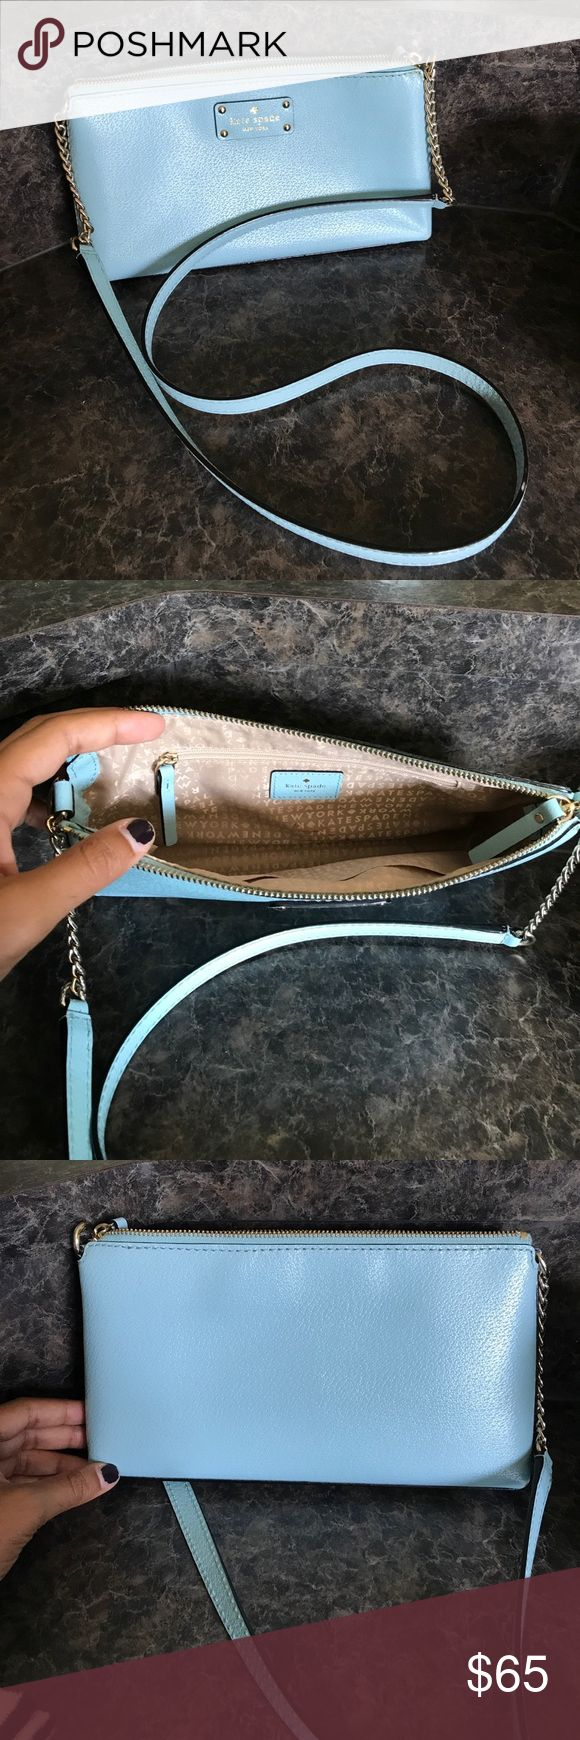 Kate Spade purse Light blue purse kate spade Bags Crossbody Bags